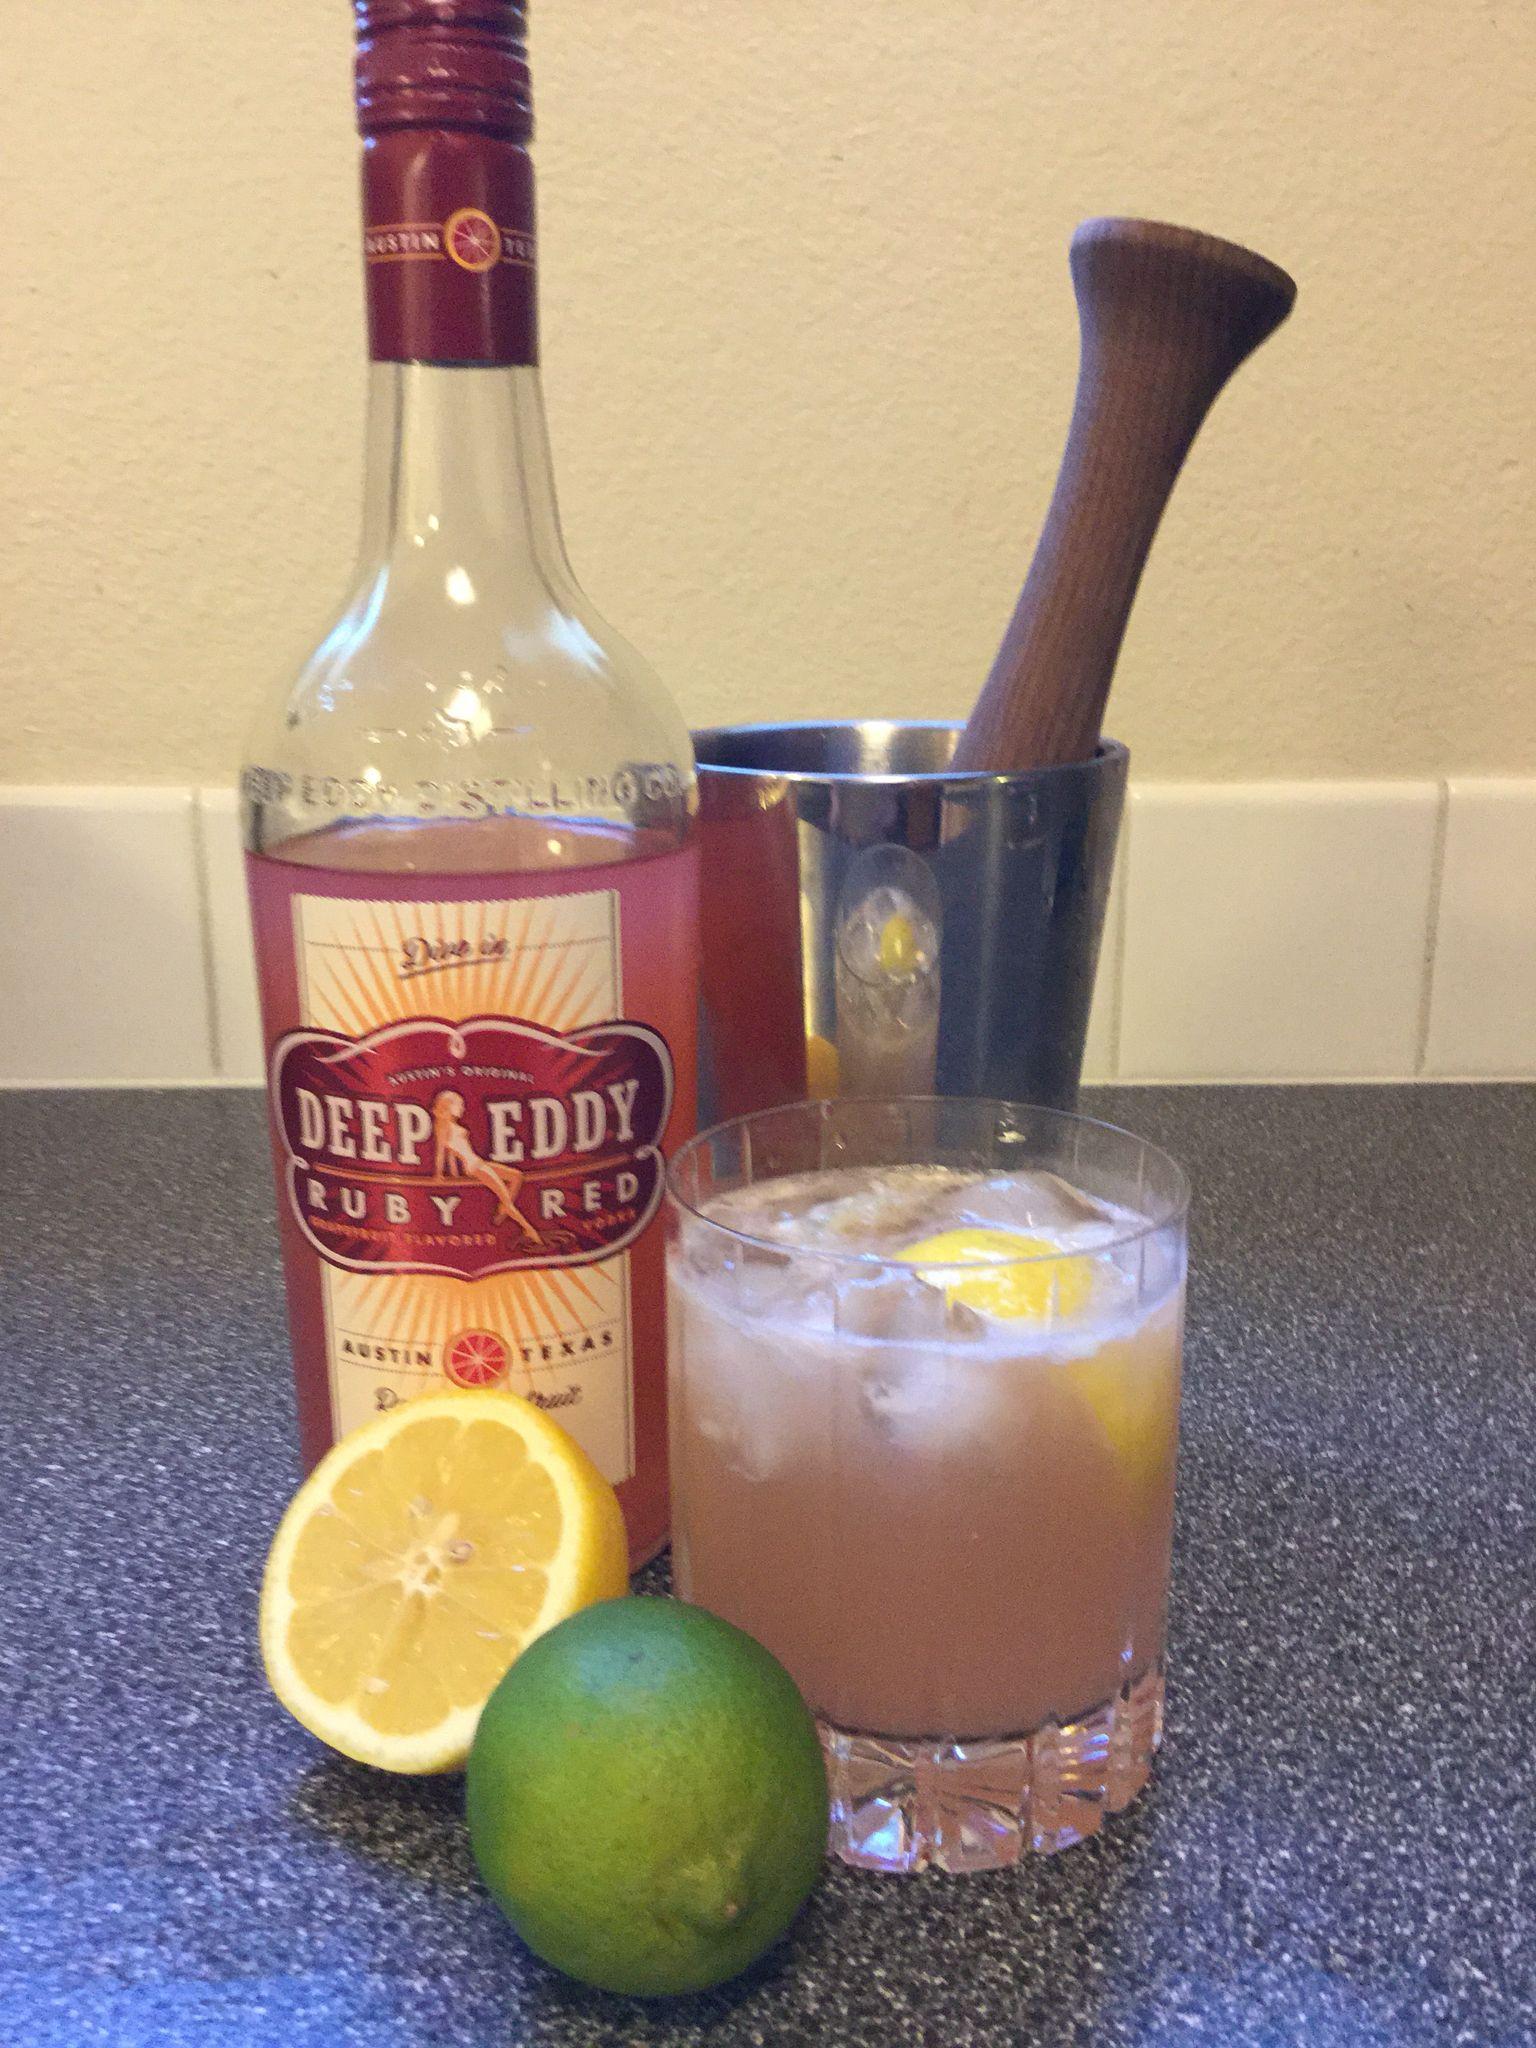 Best Summer Vodka Drinks  Best summer time drink 2 parts Deep Eddy Grapefruit Vodka